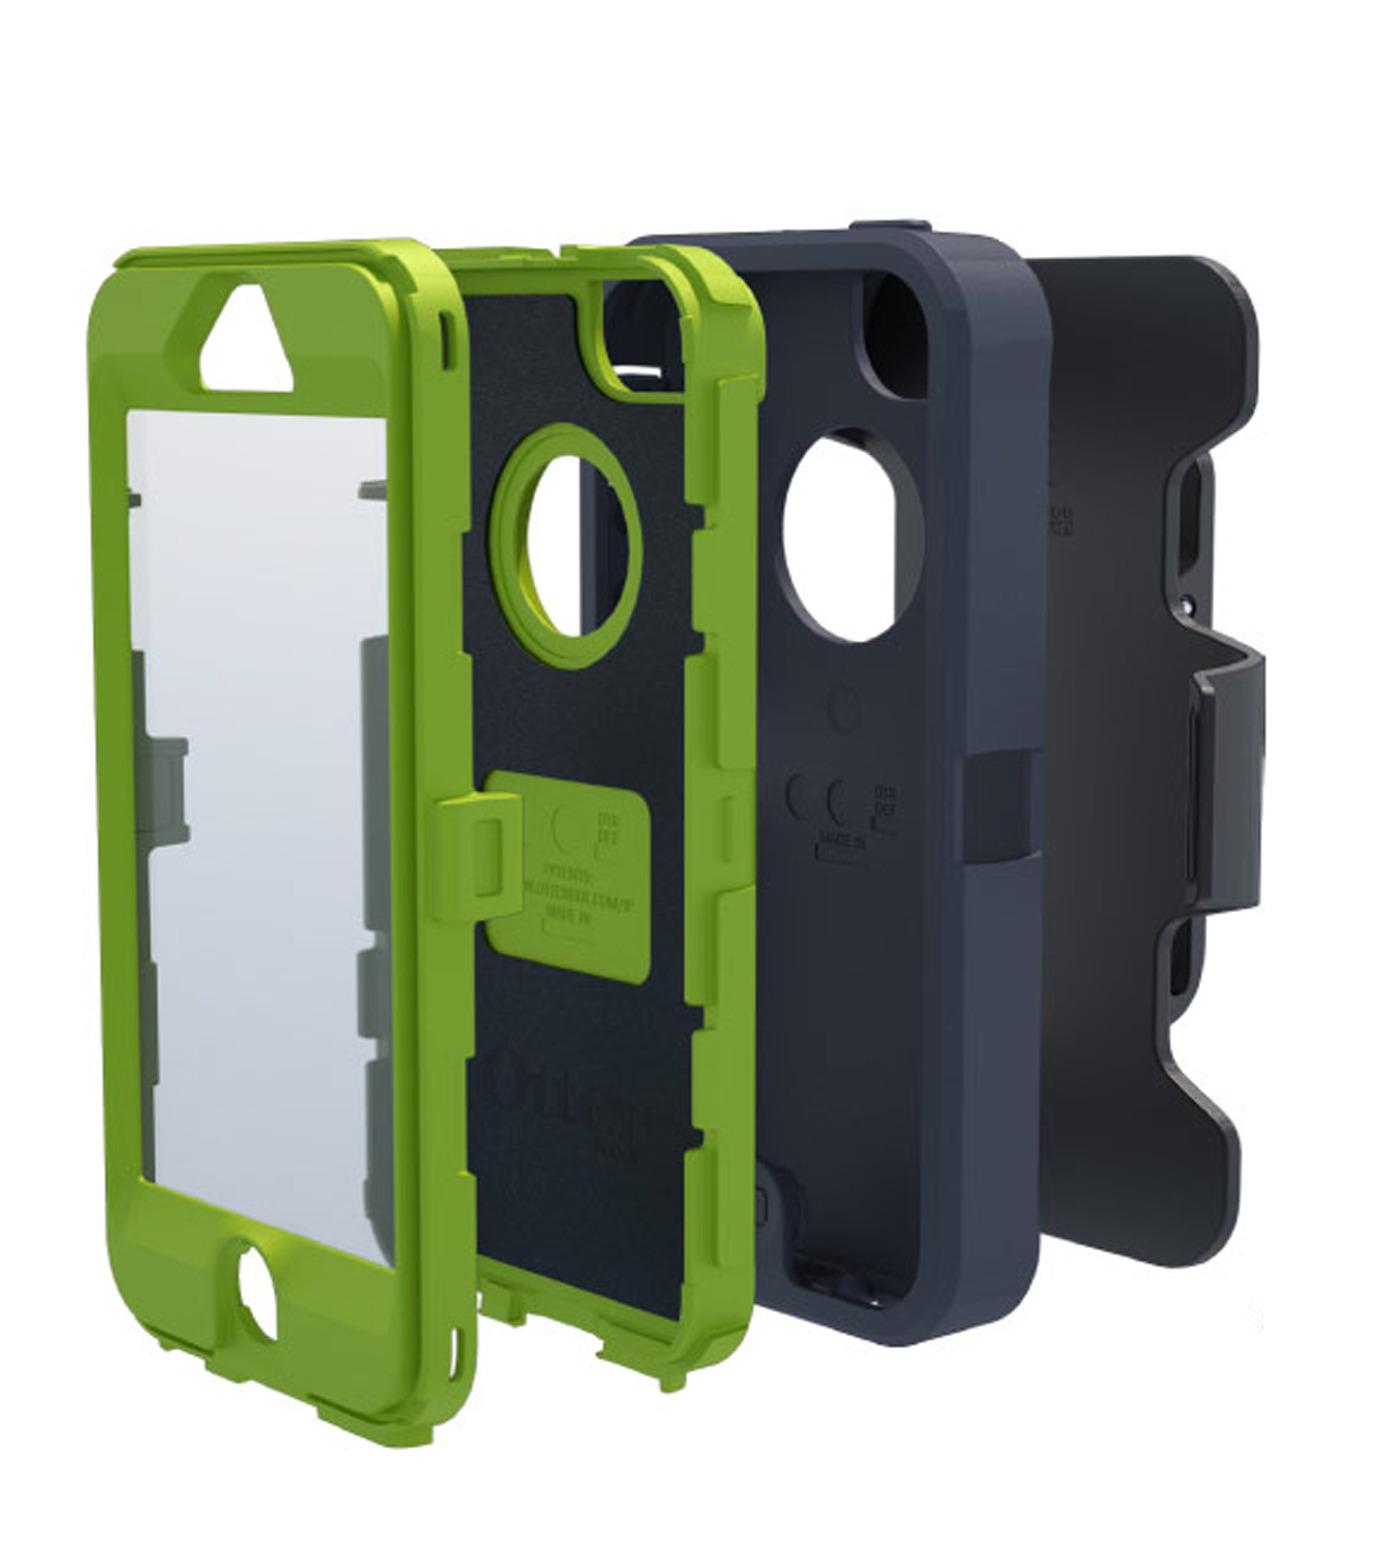 Tunewear(チューンウエア)のiPhone5 Case-BLUE-OTB-PH-013-92 拡大詳細画像4